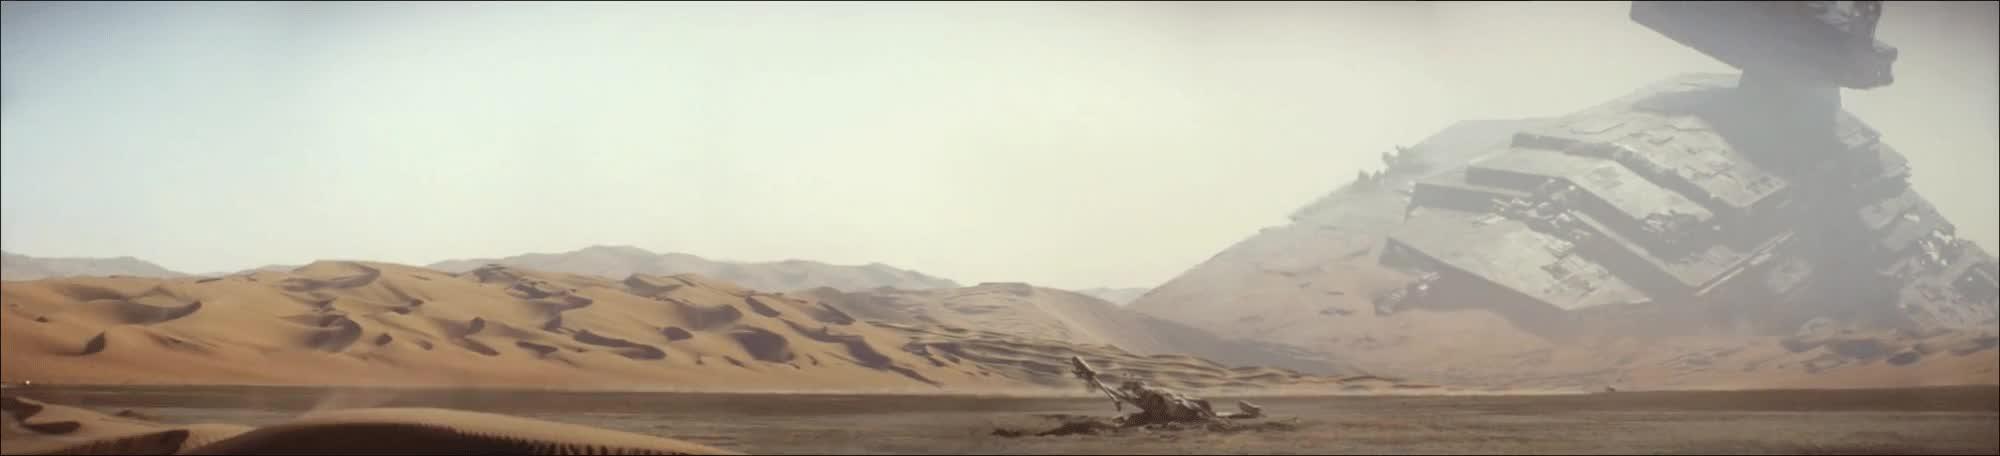 Star Wars Panorama : HighQualityGifs GIFs